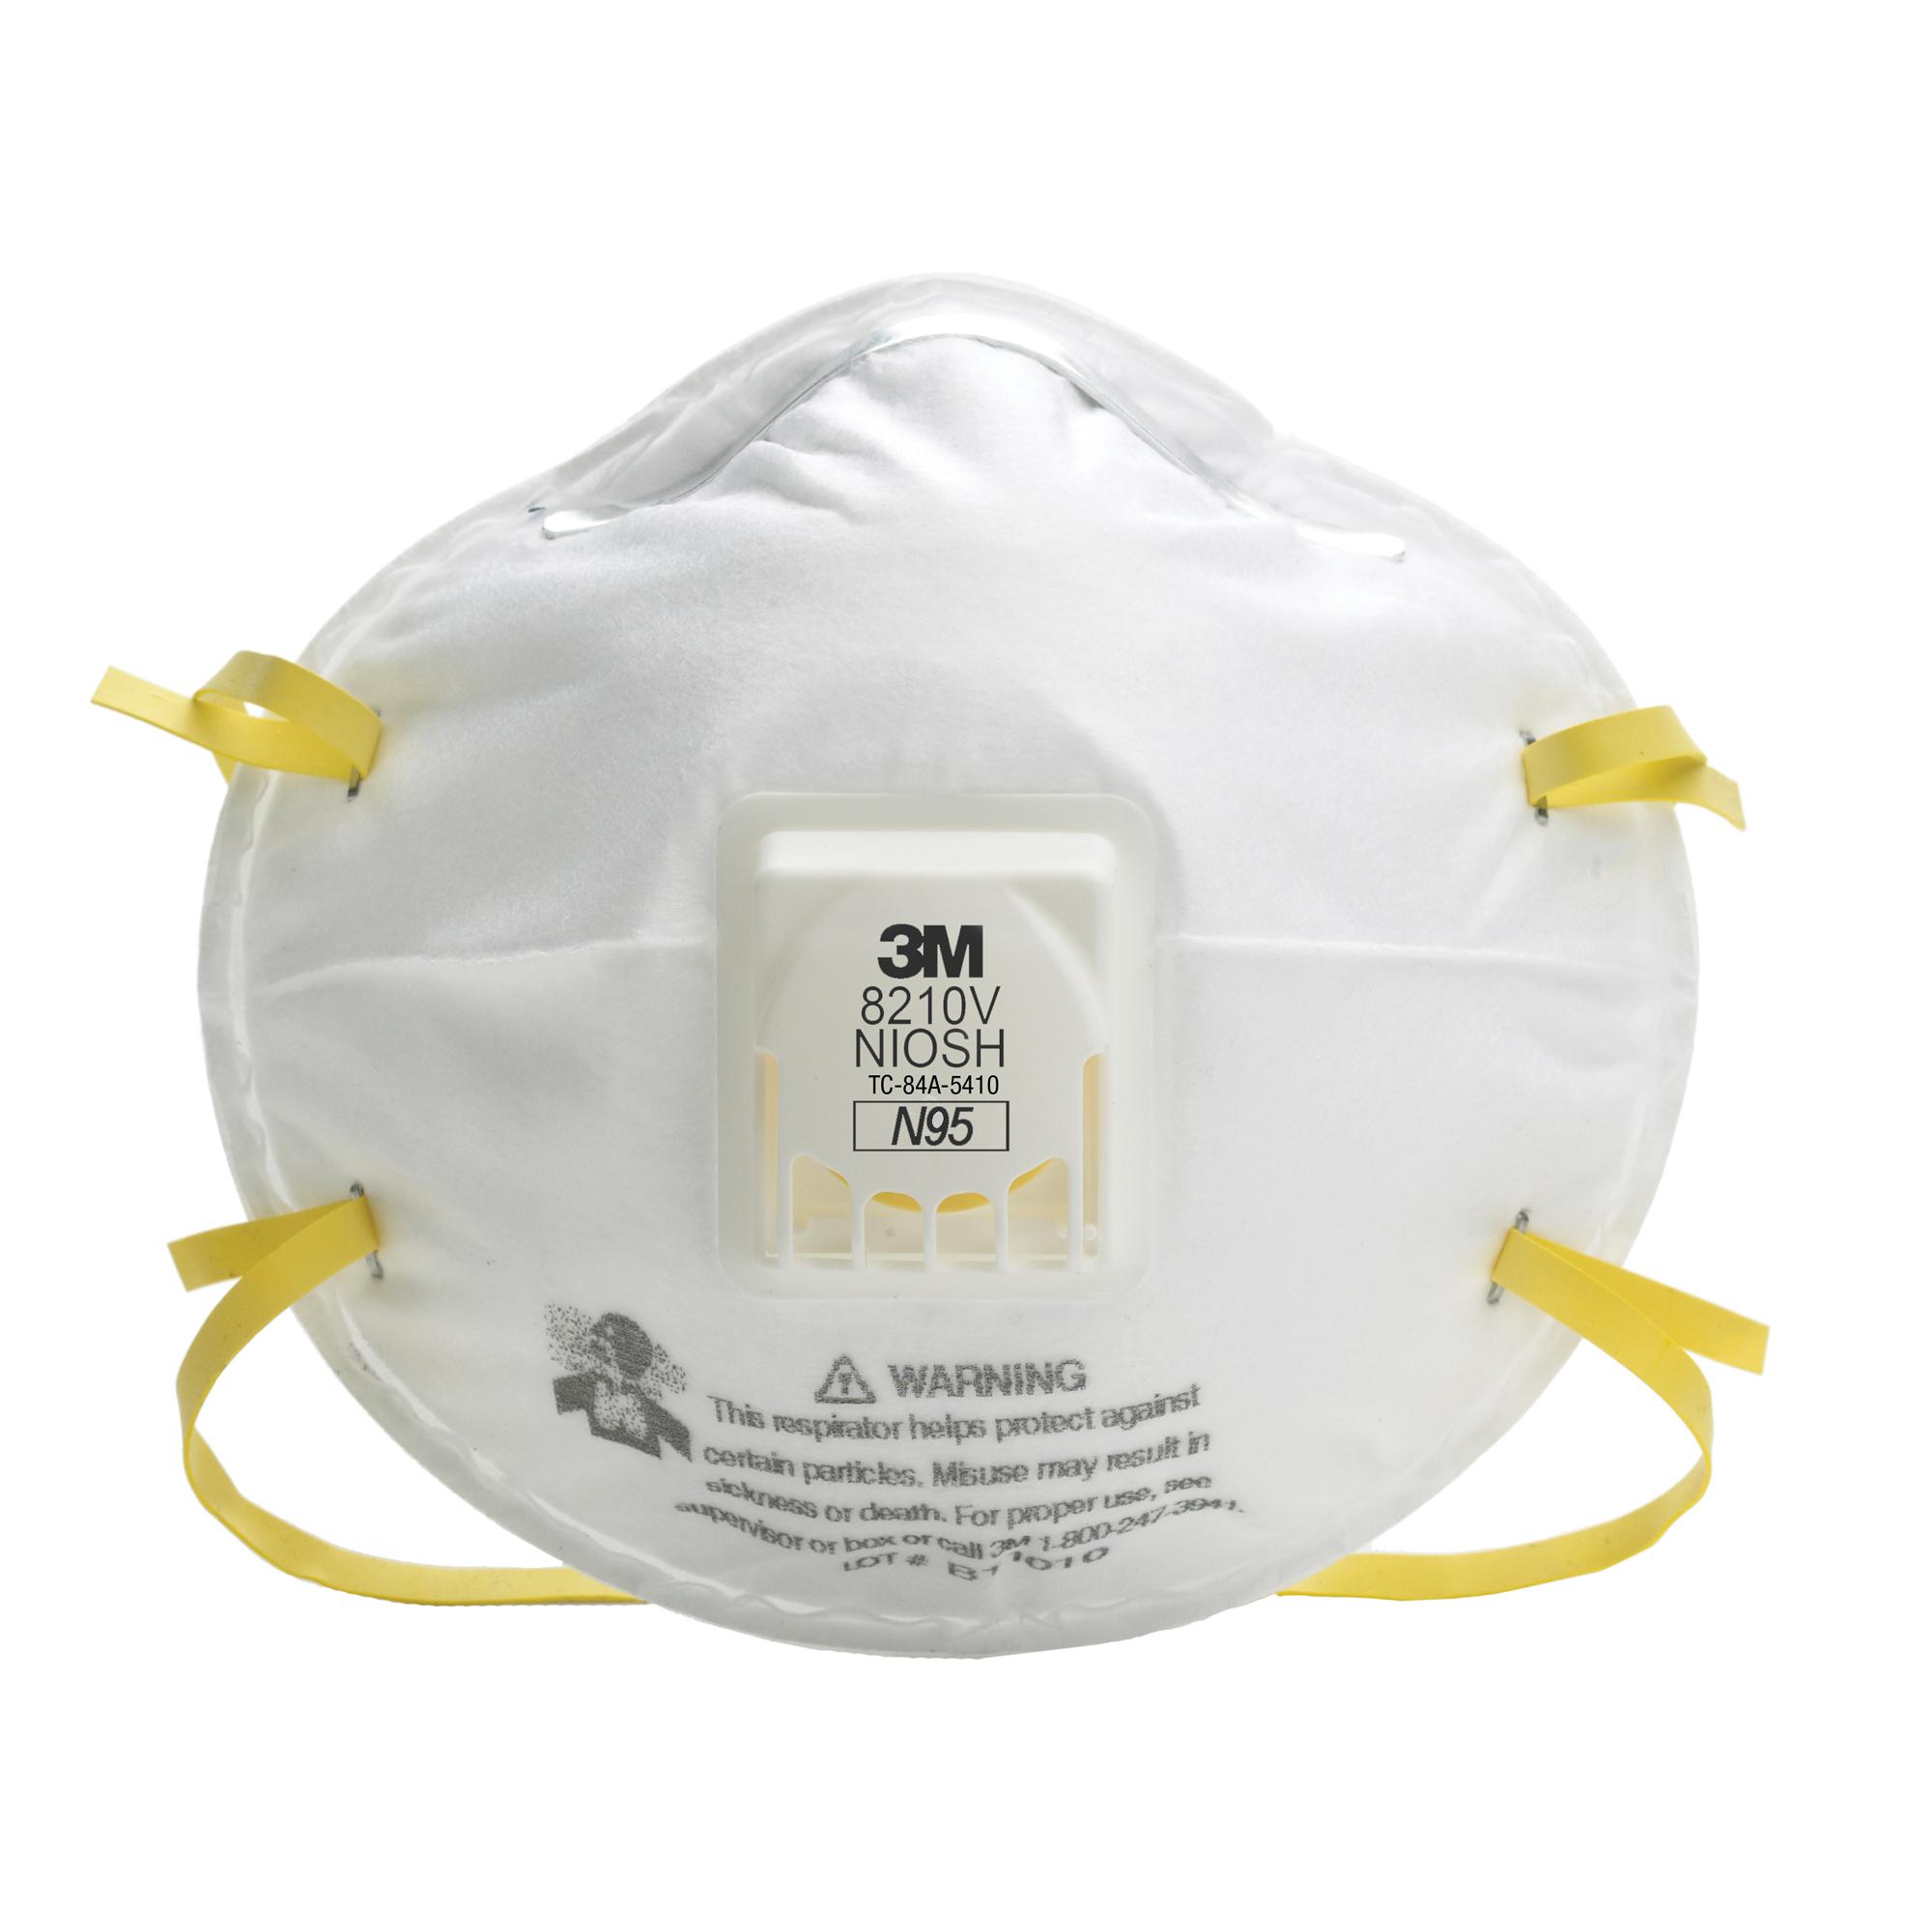 Scn N95 Industrial Particulate 8210v 3m Respirators